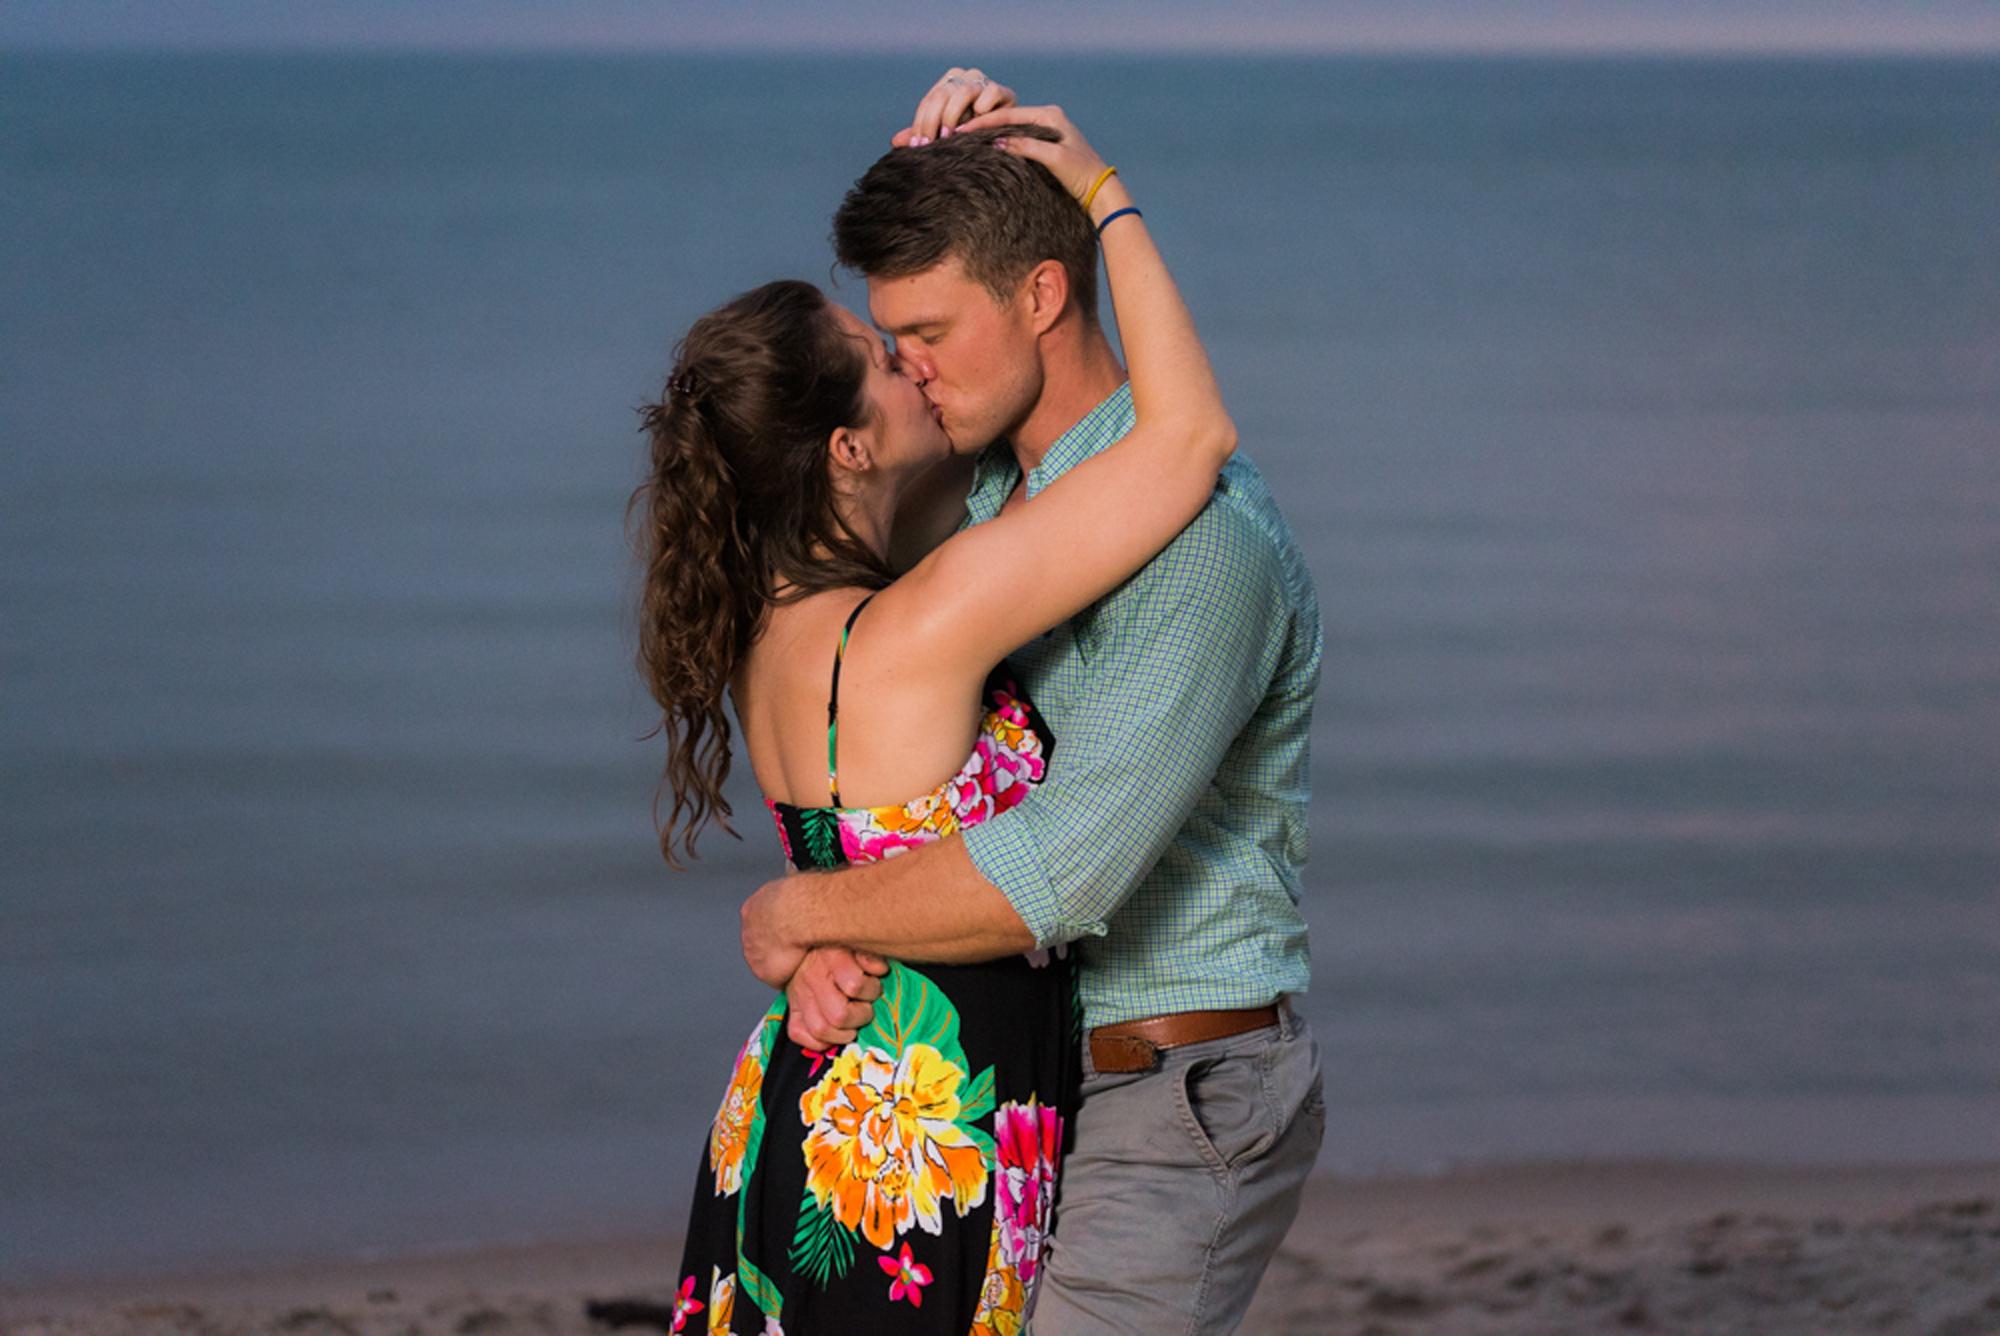 south-haven-michigan-beach-engagement-proposal-photographer-sydney-marie (20).jpg